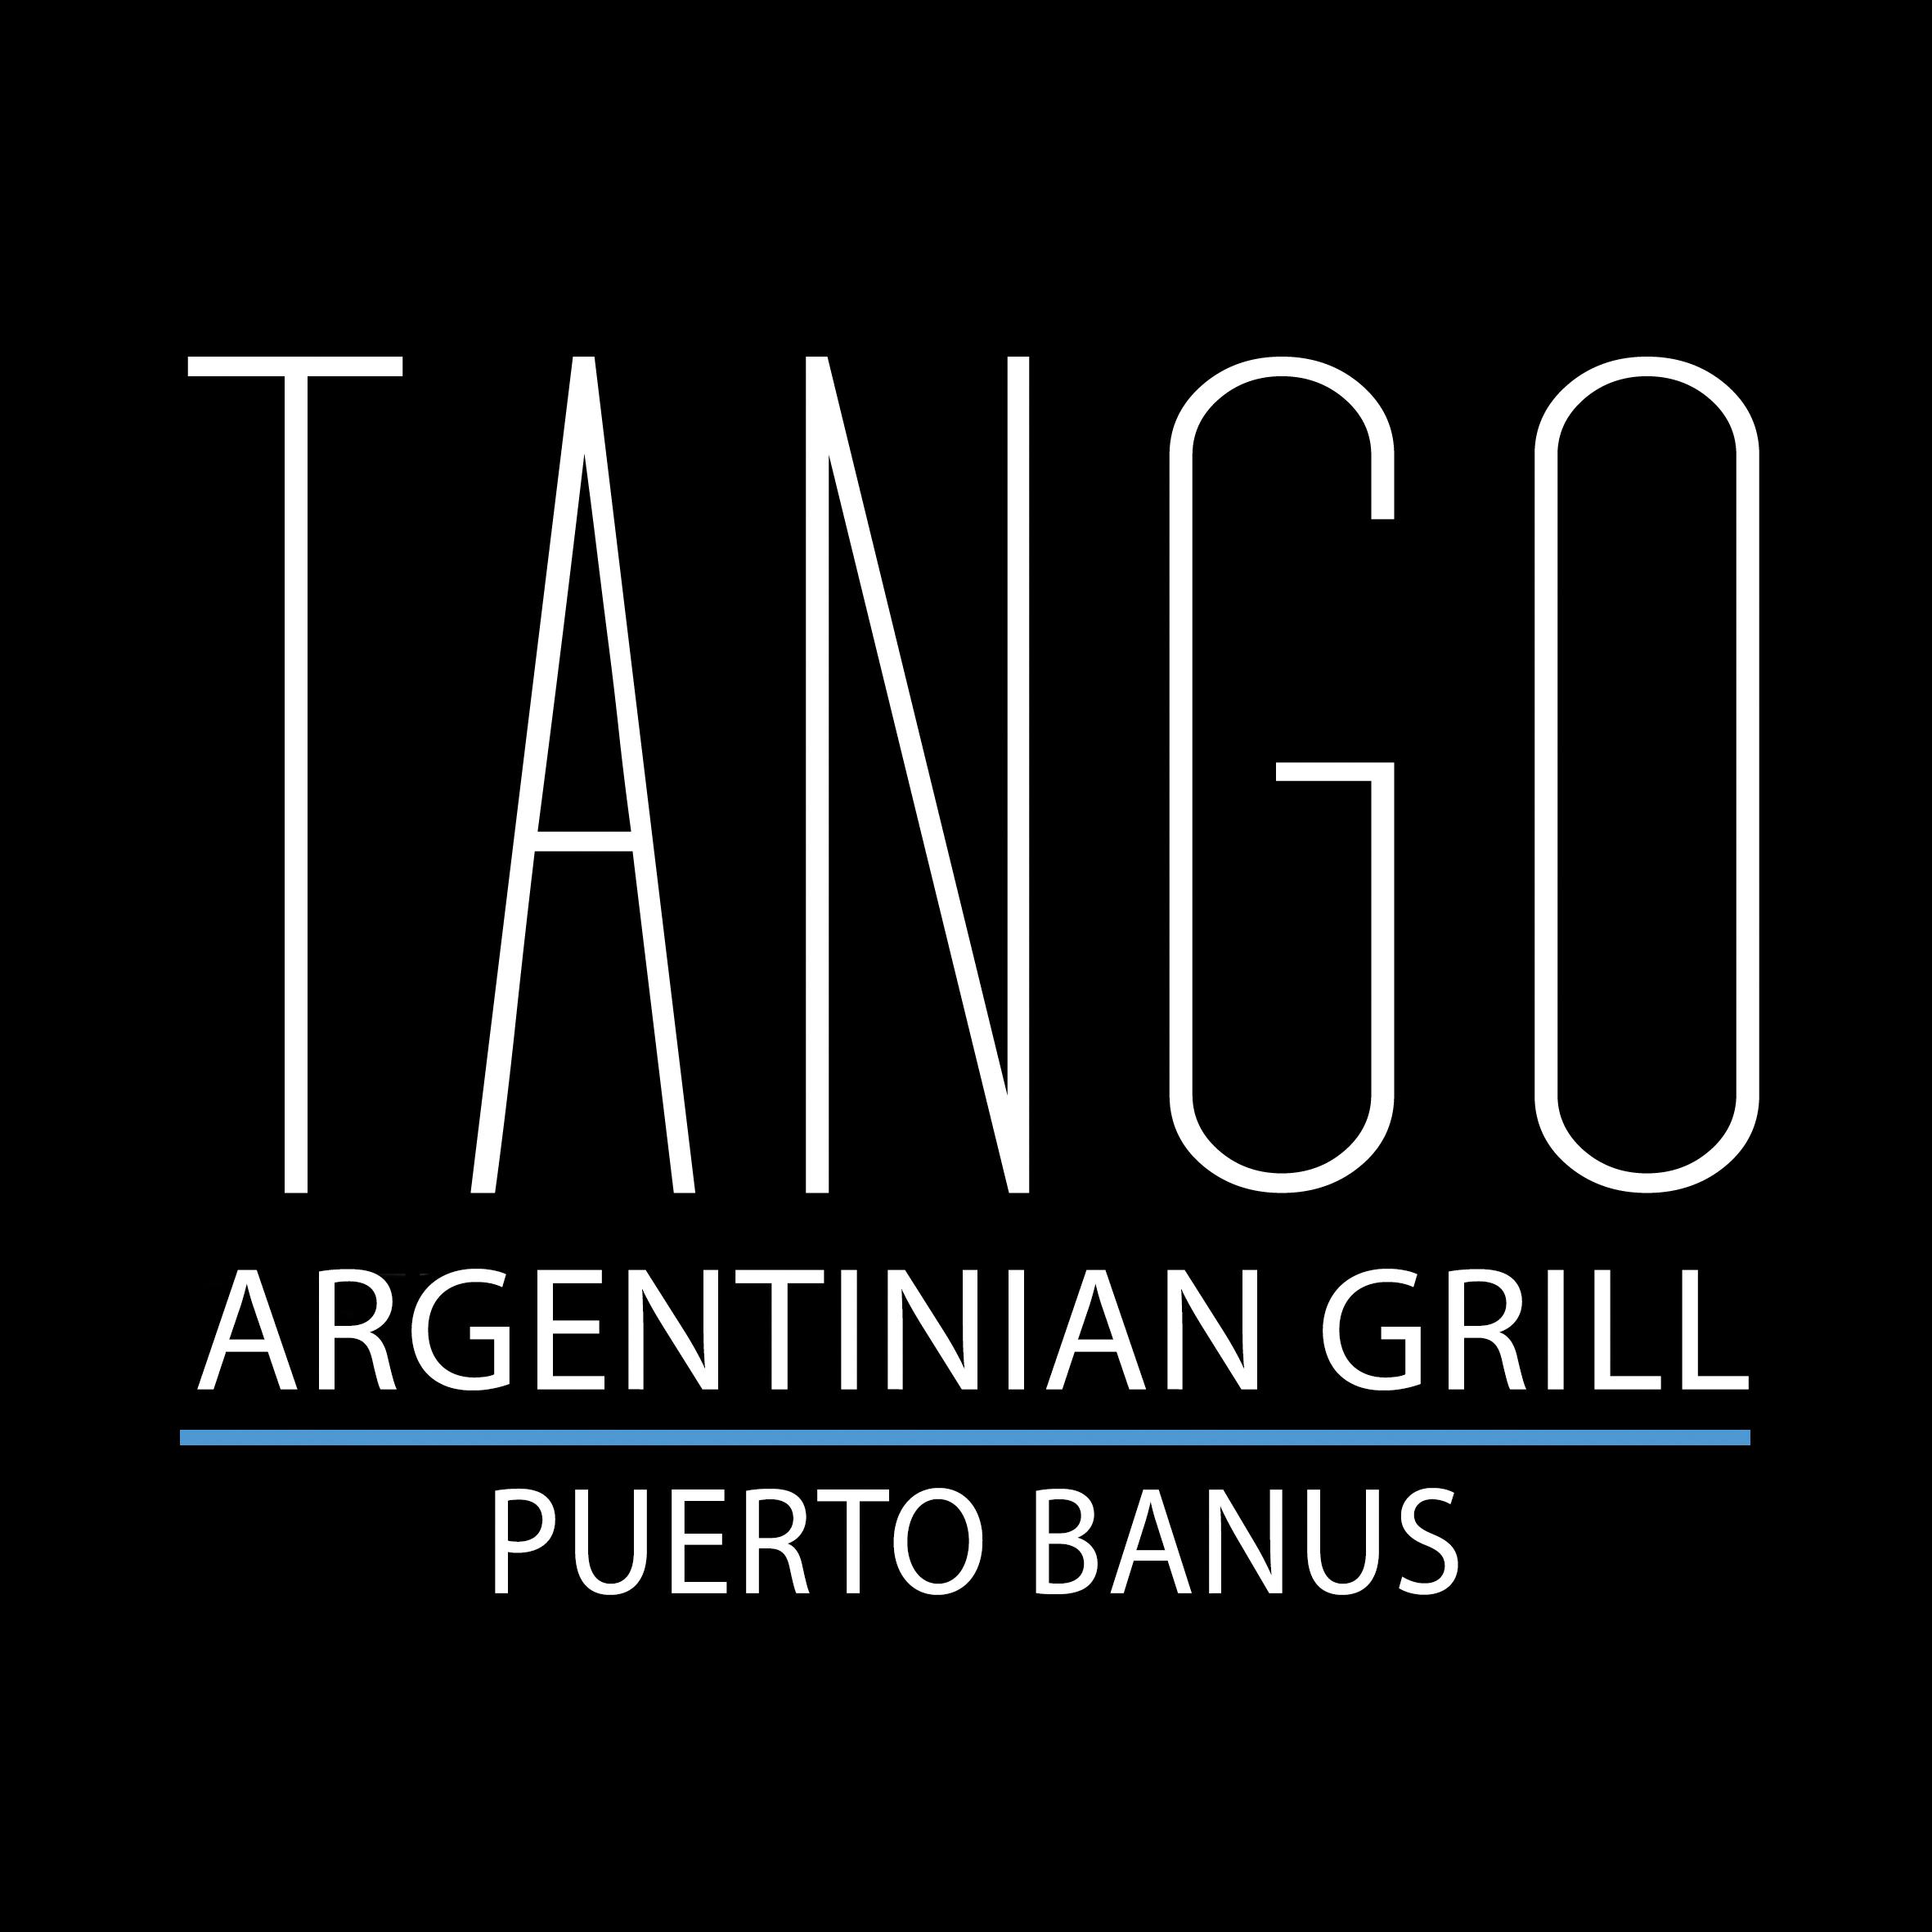 Tango Restaurante Puerto Banus - Argentinian Meat Restaurant & International Cuisine, Argentinian Grill  - Steakhouse - Marbella - Spain